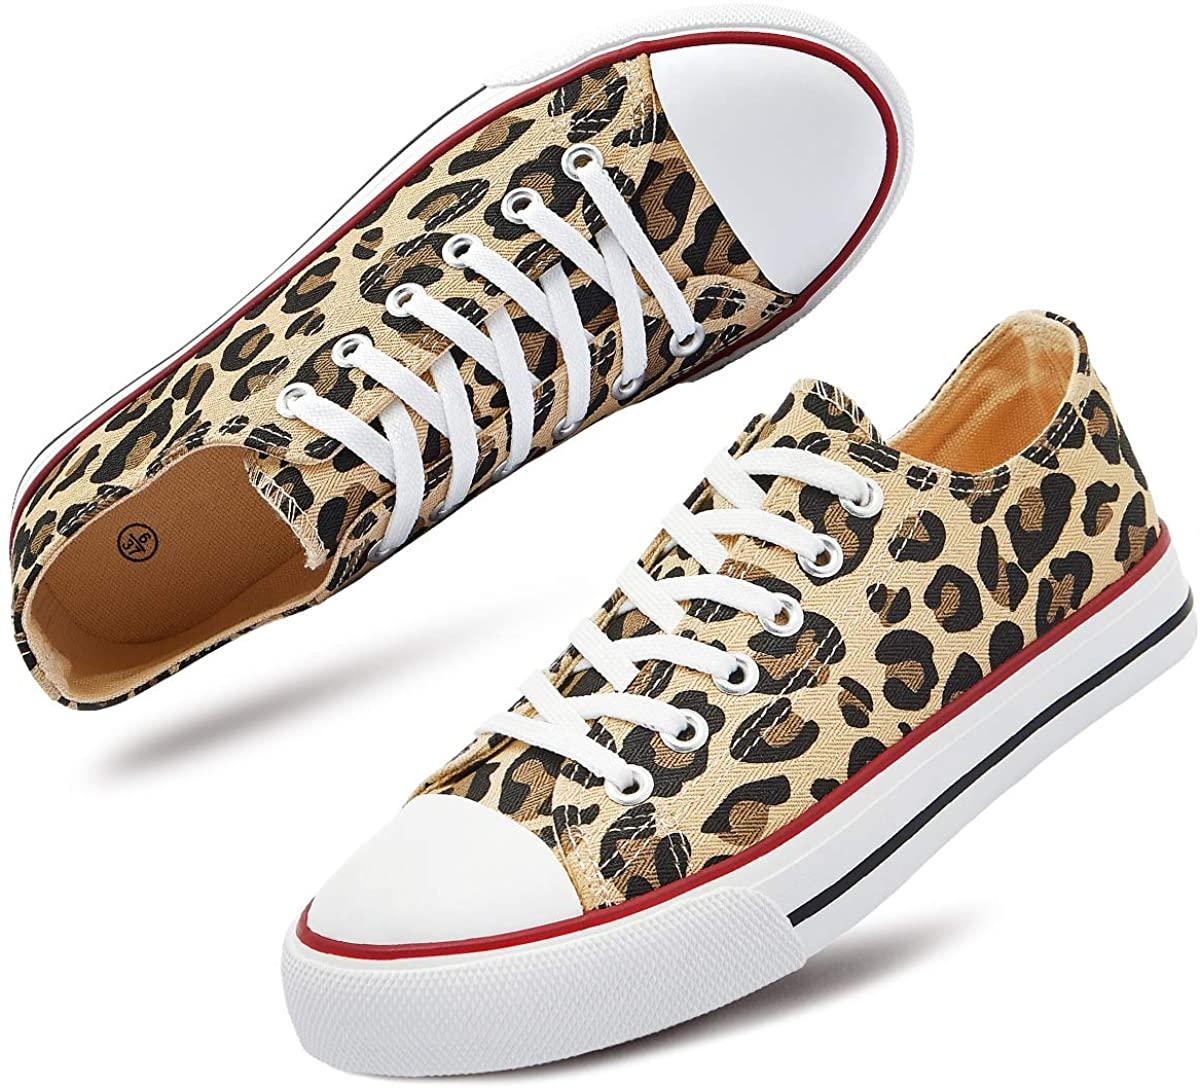 Women's Canvas Sneaker Classic Low Top Fashion Sneaker Casual Shoes…